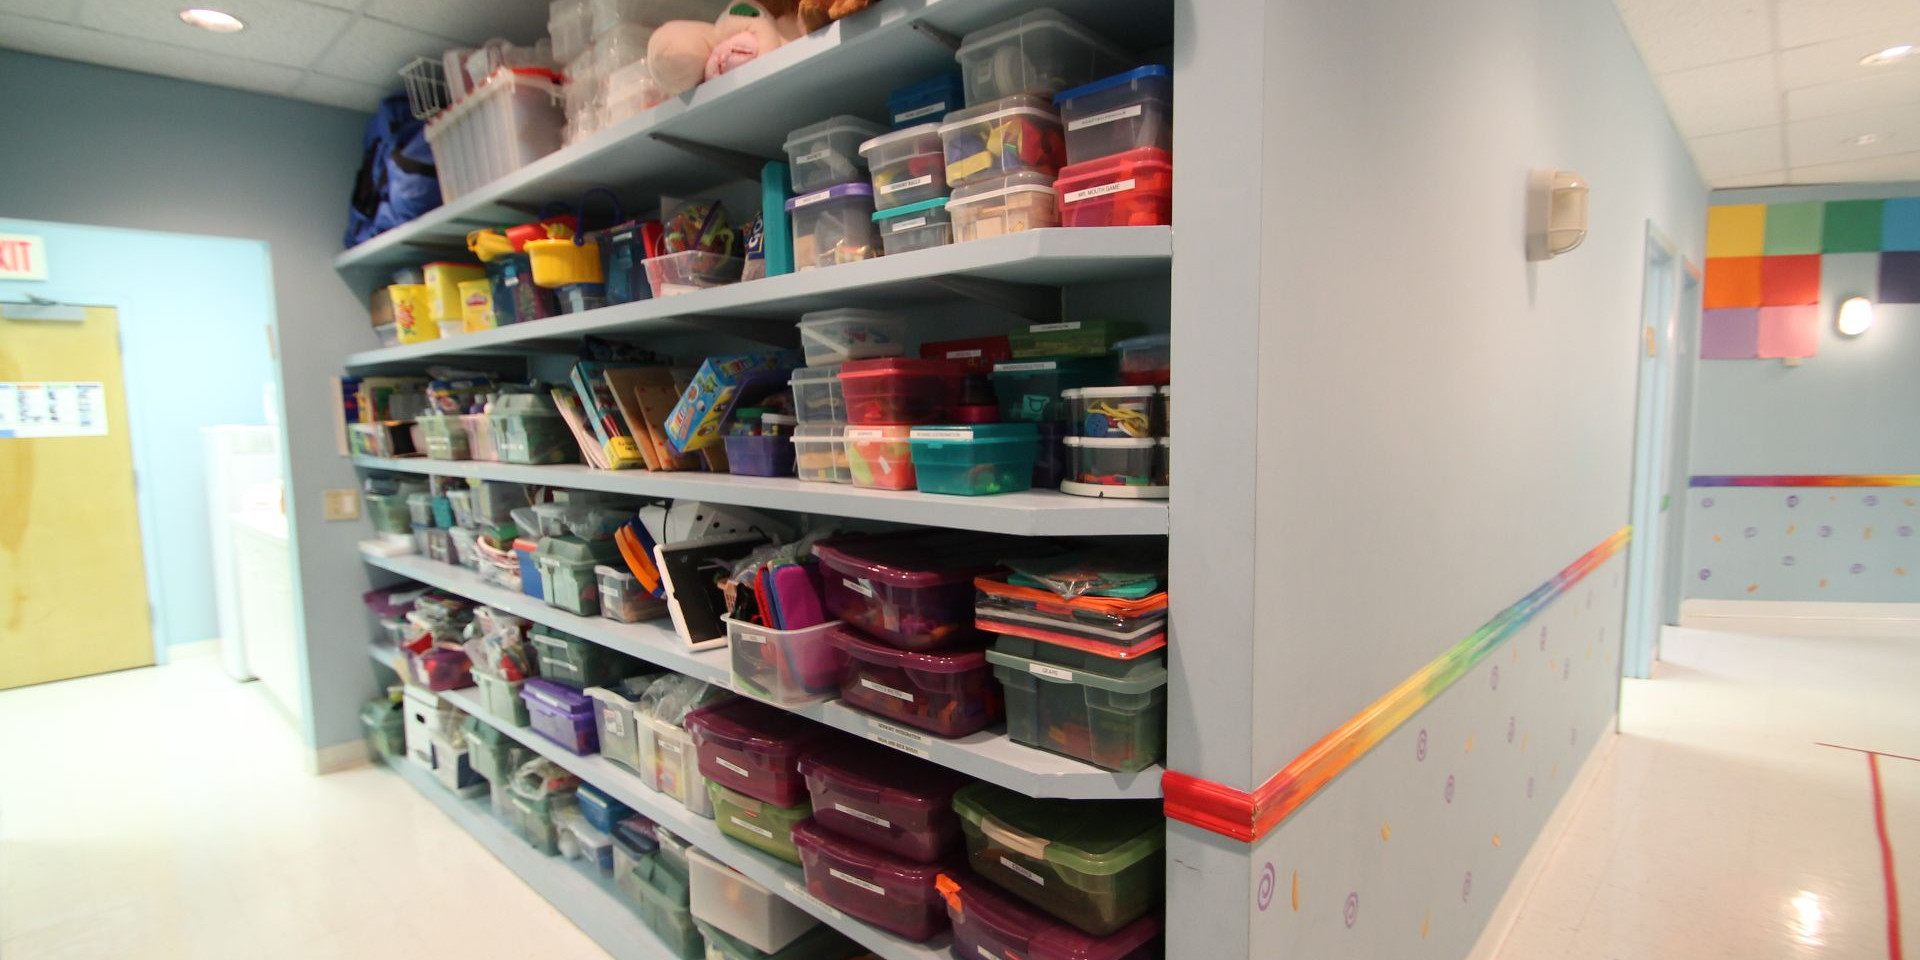 A sneak peek at the toy shelves